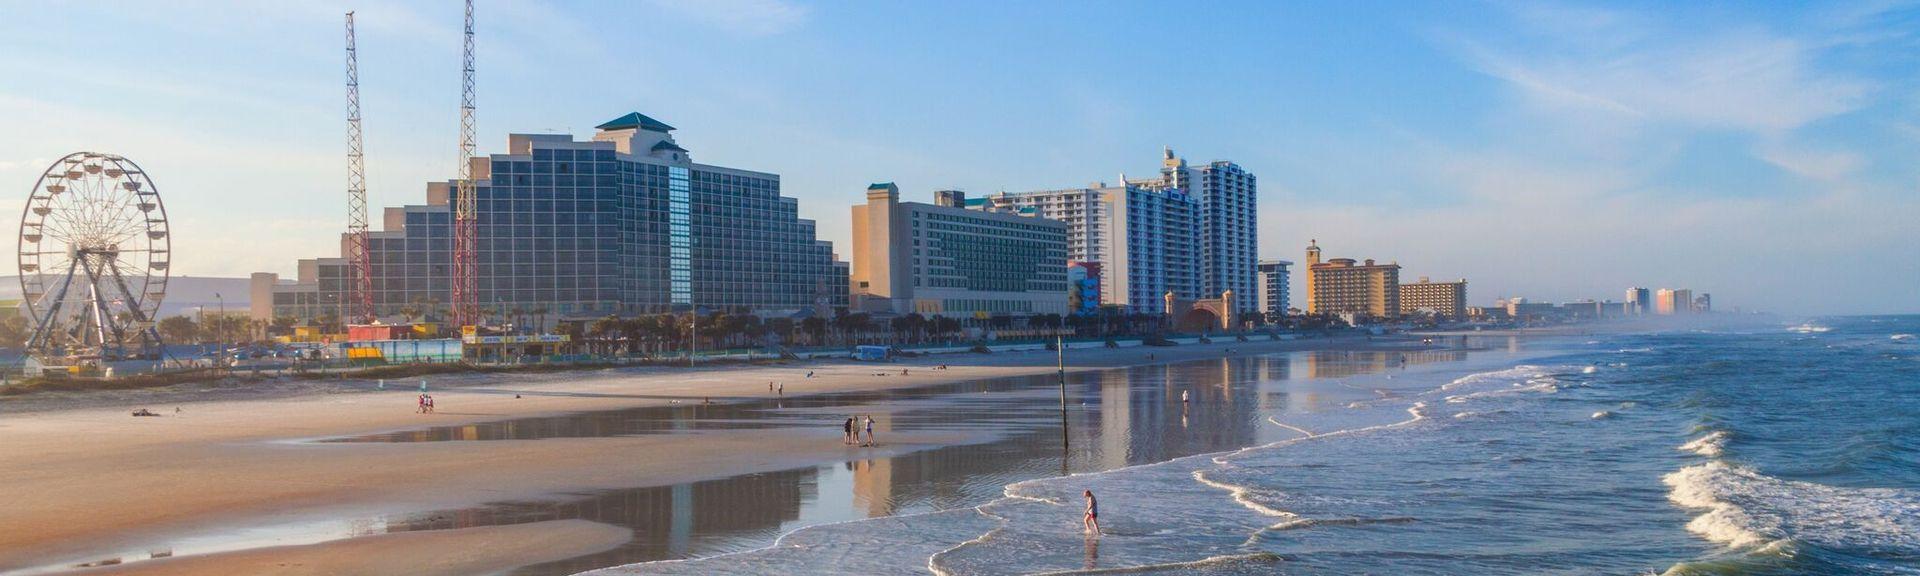 Vrbo Daytona Beach Fl Vacation Rentals House Rentals More